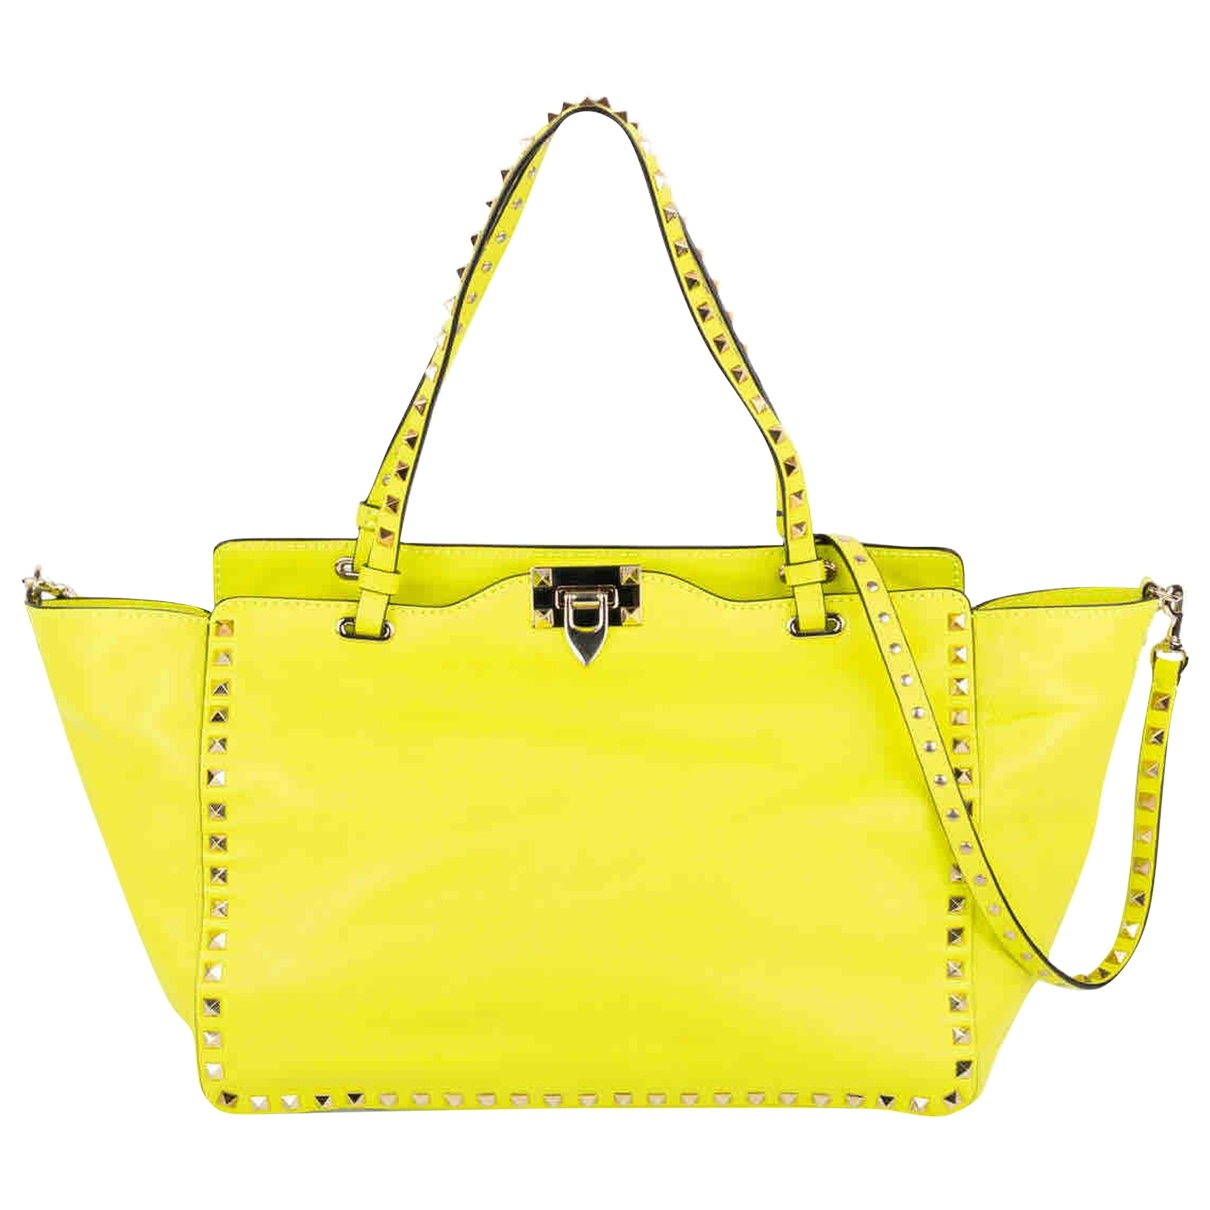 Valentino Garavani Rockstud Yellow Leather handbag for Women \N